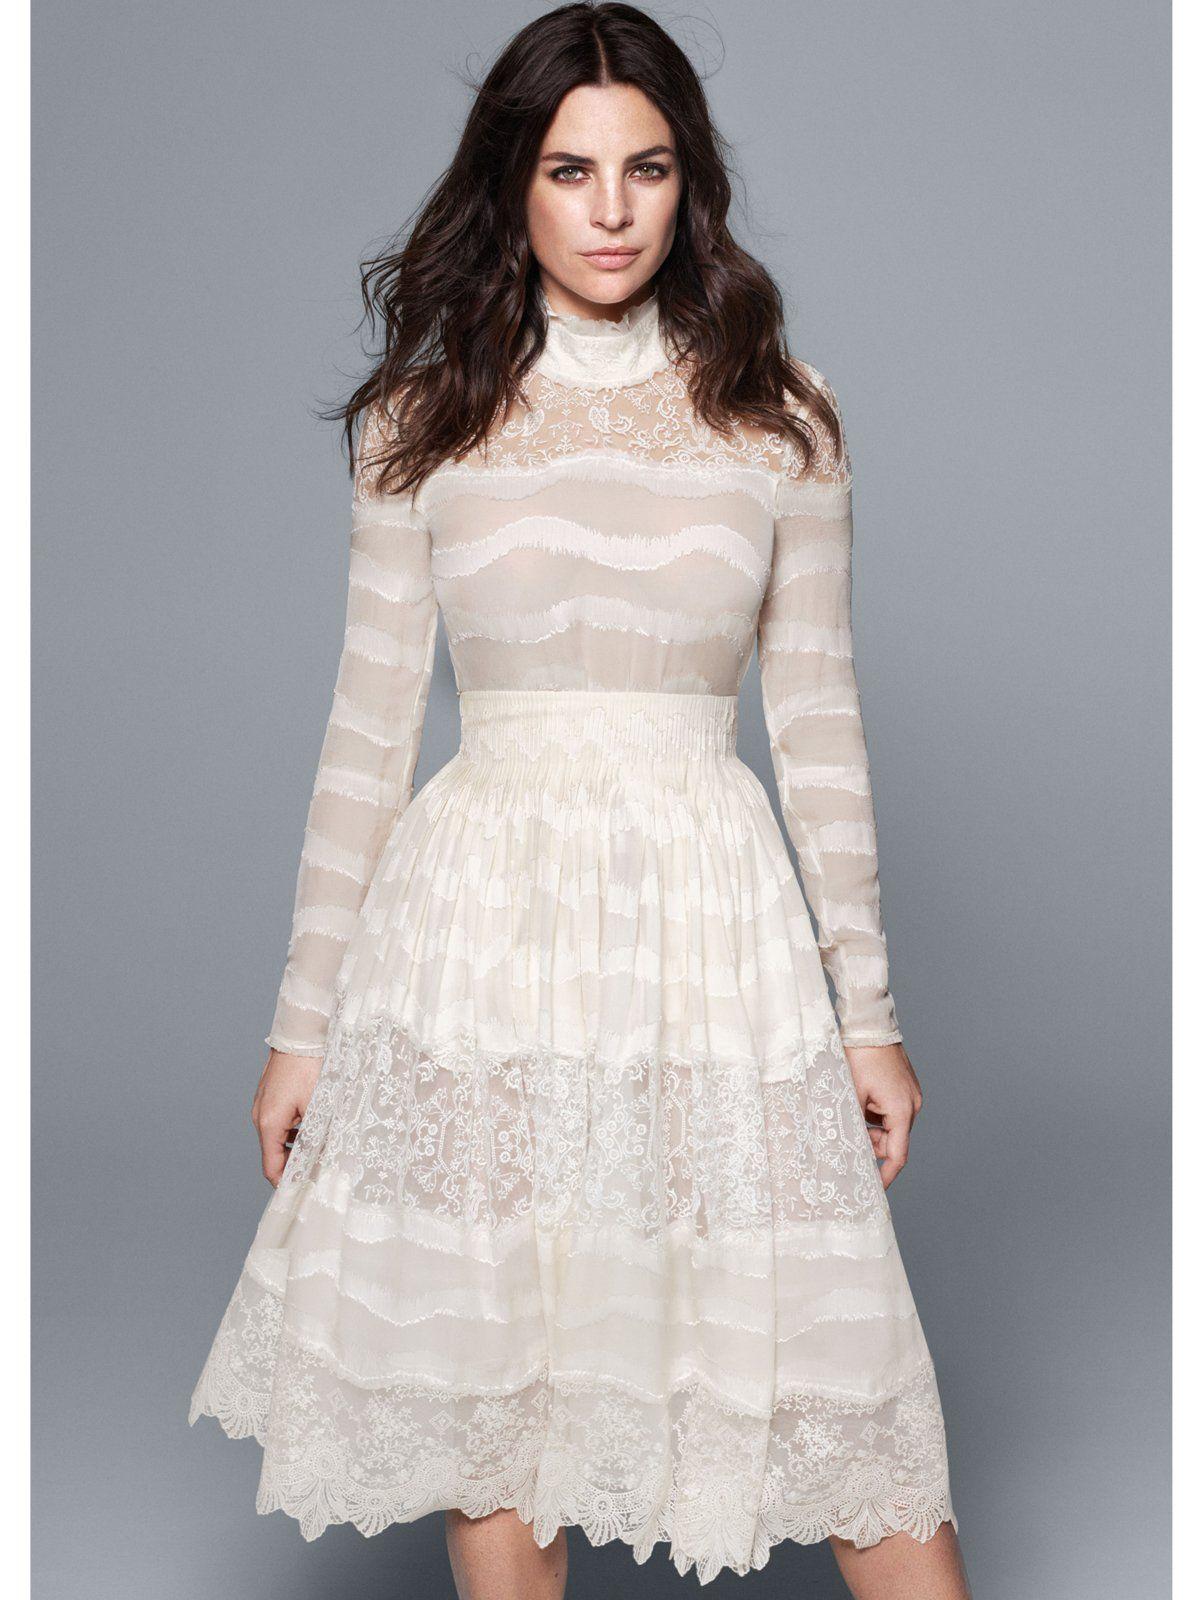 Günstig Brautkleider